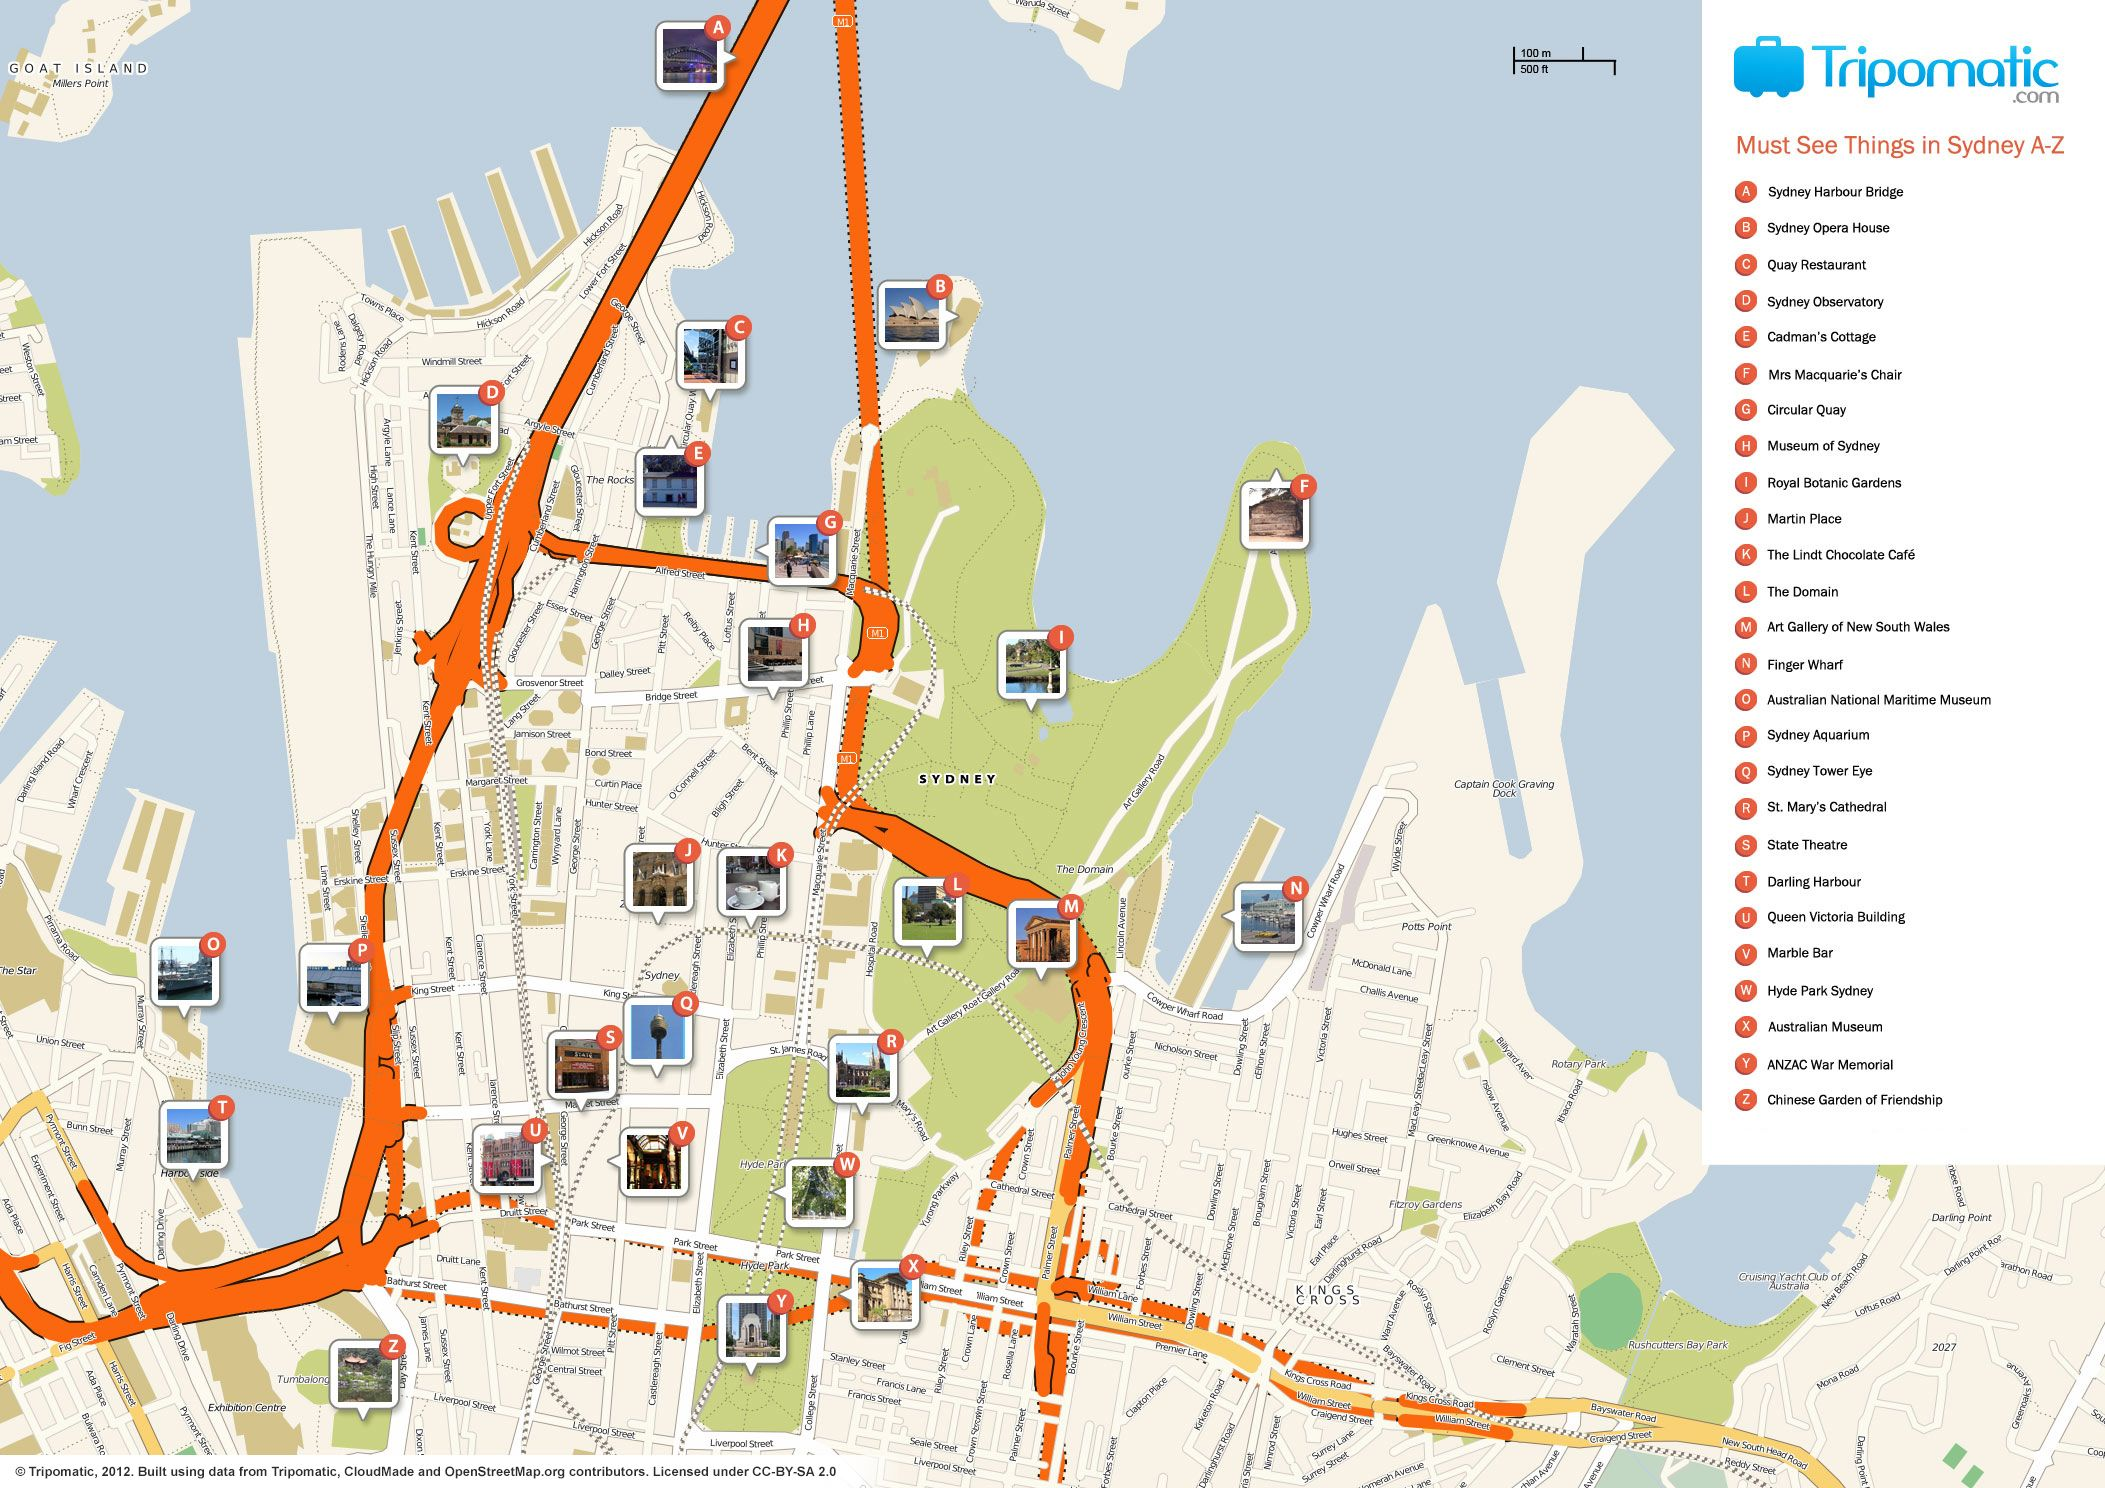 sydney cbd map tourist sydney maps top tourist attractions free